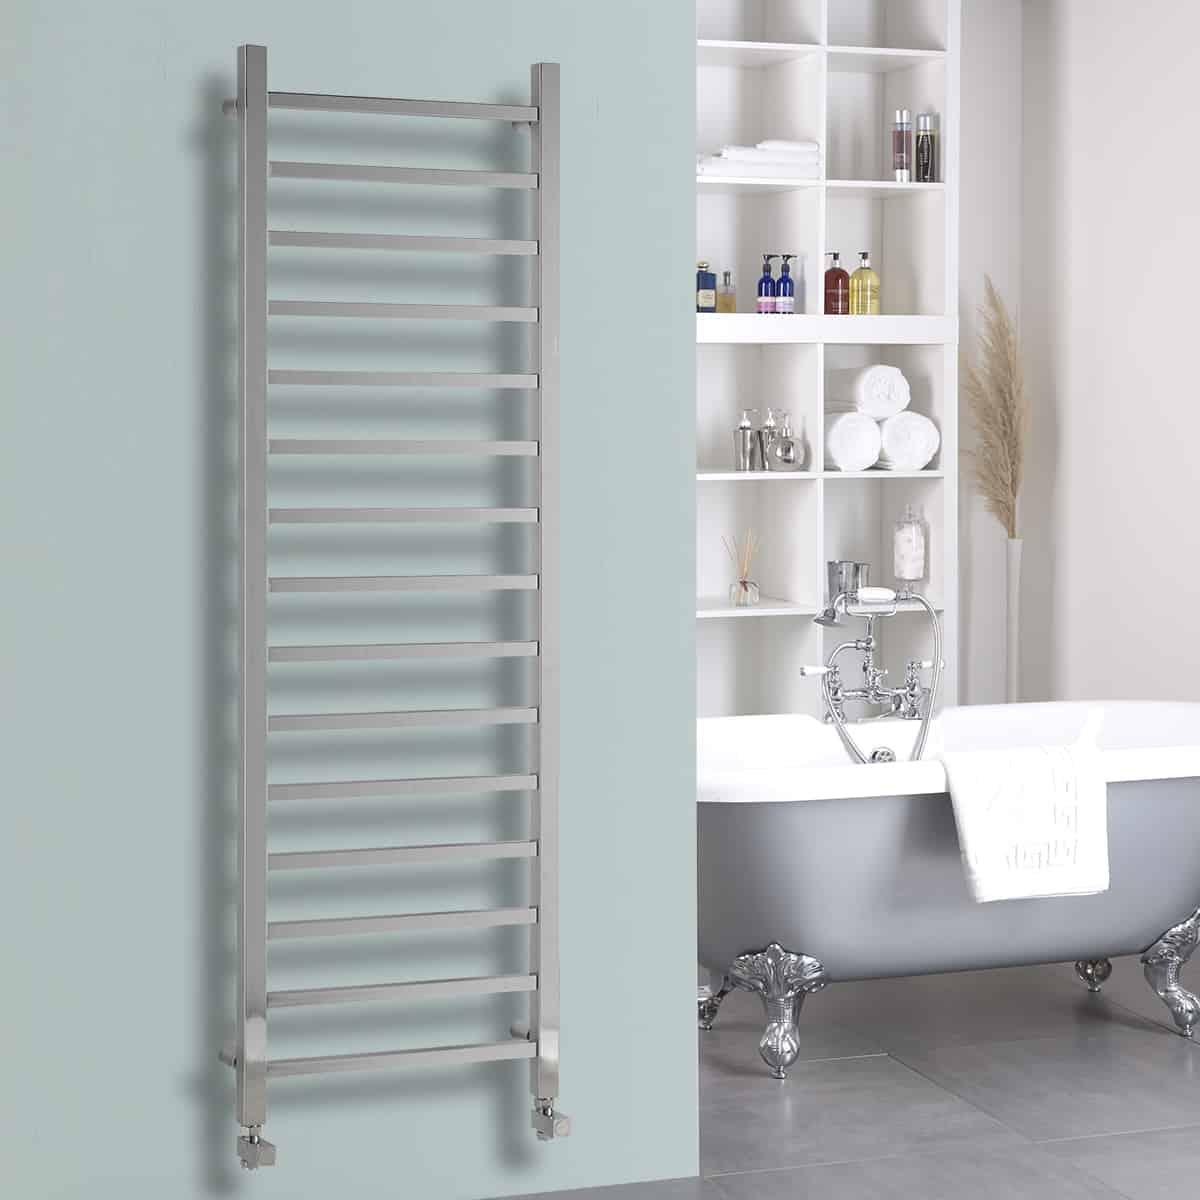 Bathroom heated towel radiators - Ballaugh Modern Thermostatic Electric Heated Towel Rail Warmer Radiator Square Tube Chrome Timer